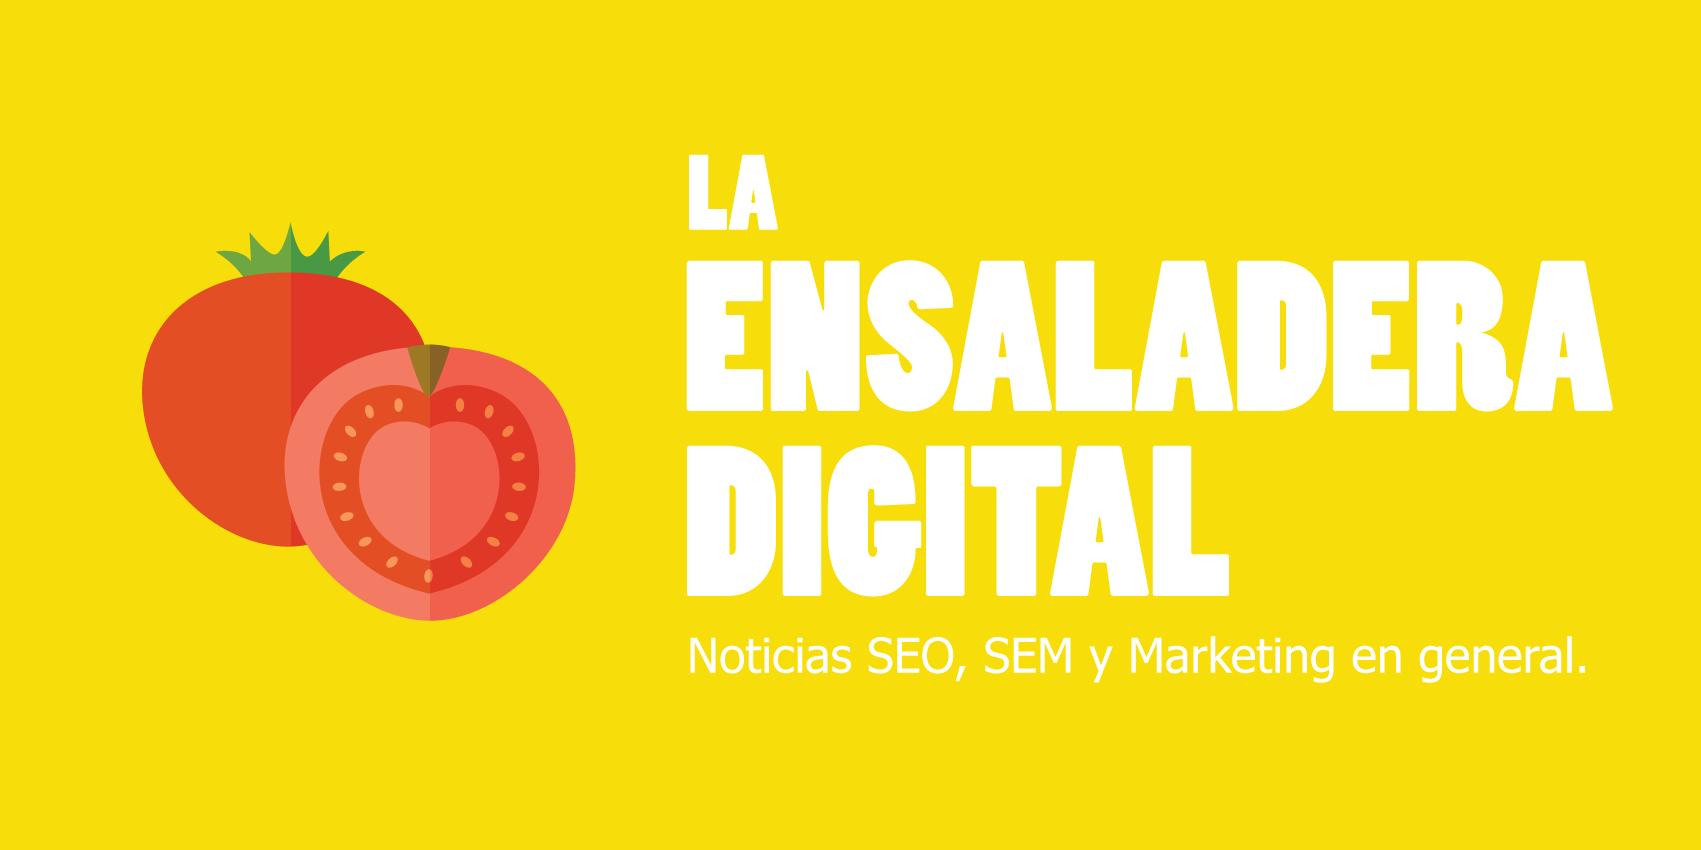 la-ensaladera-digital-01